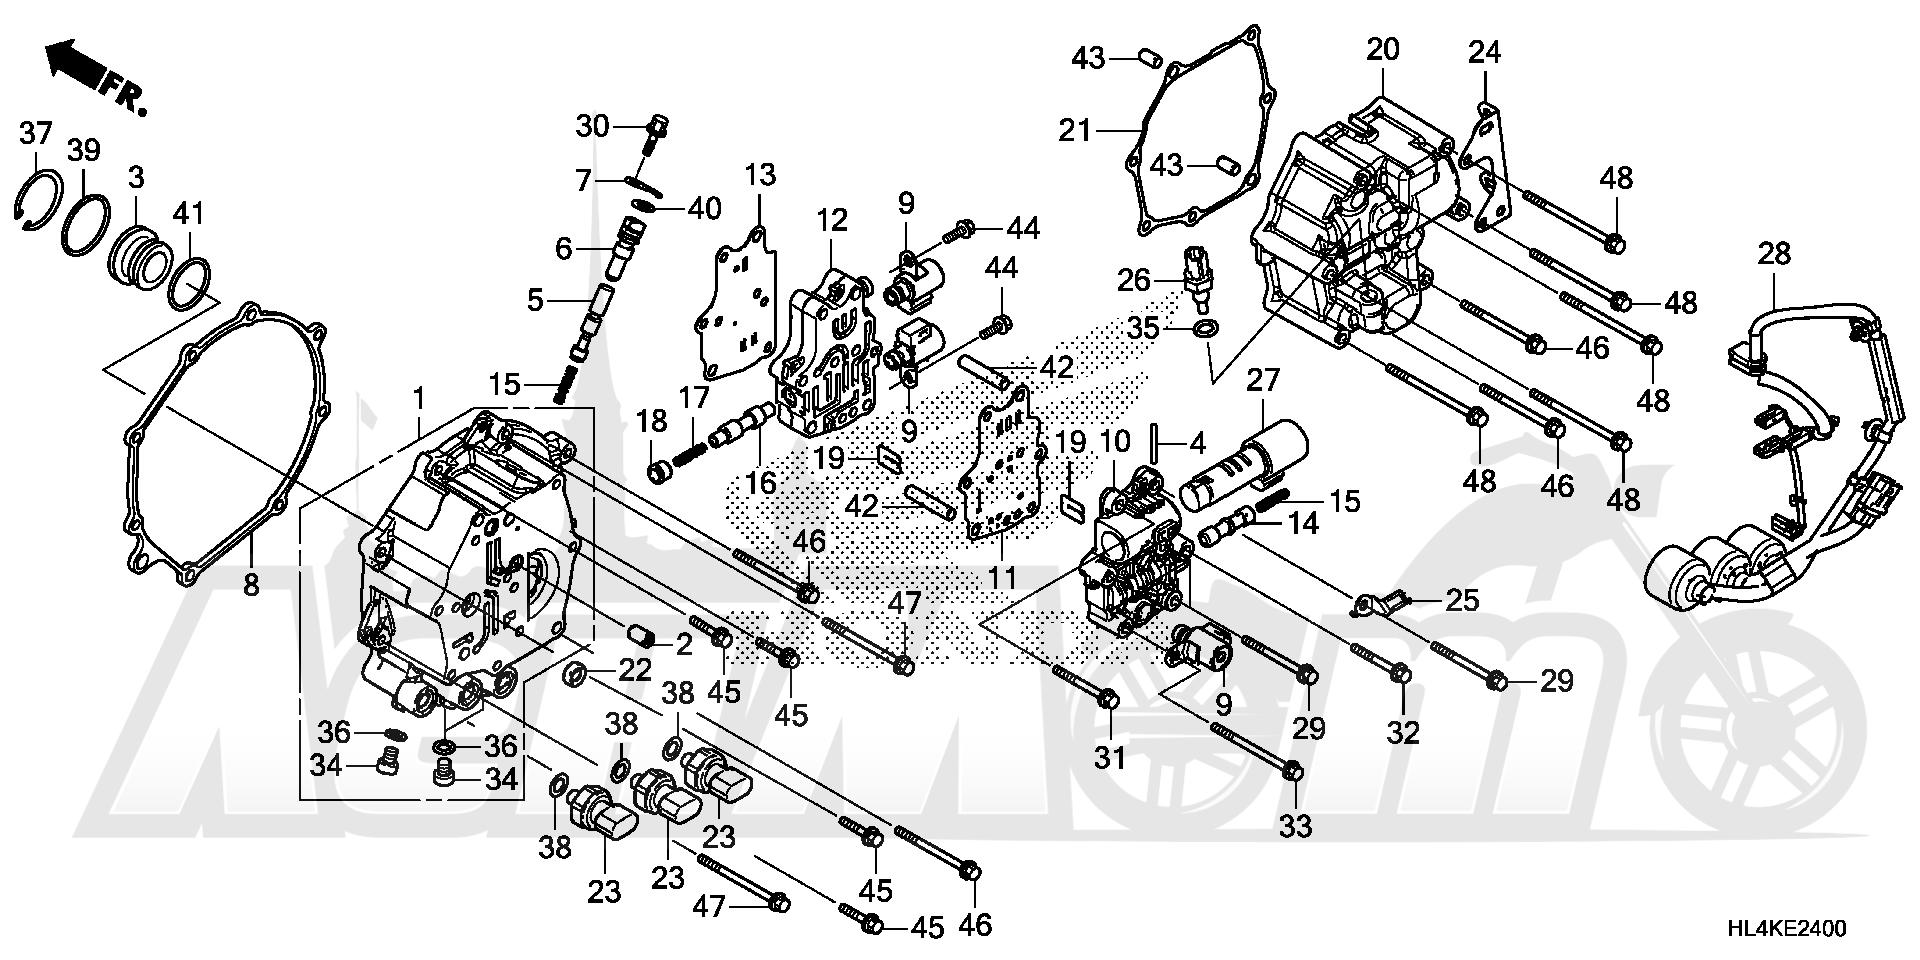 Запчасти для Квадроцикла Honda 2019 SXS1000M5D Раздел: SOLENOID VALVE | реле, соленоид клапан